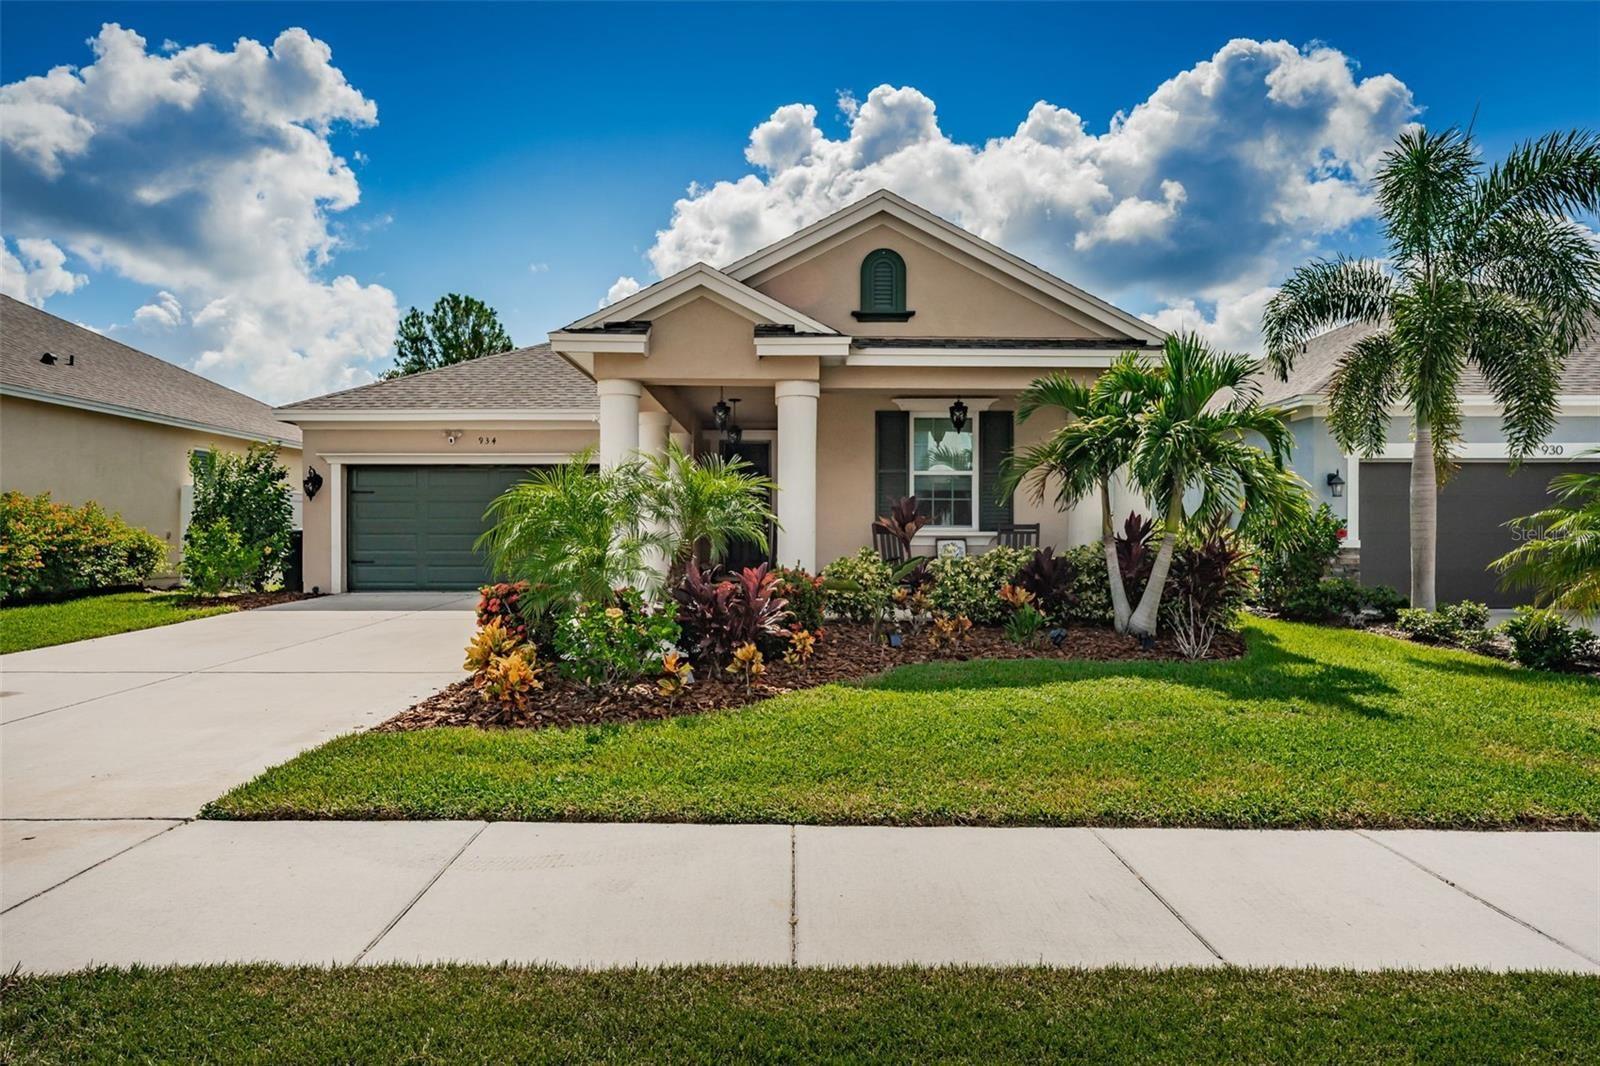 934 MOLLY CIRCLE, Sarasota, FL 34232 - #: U8131391